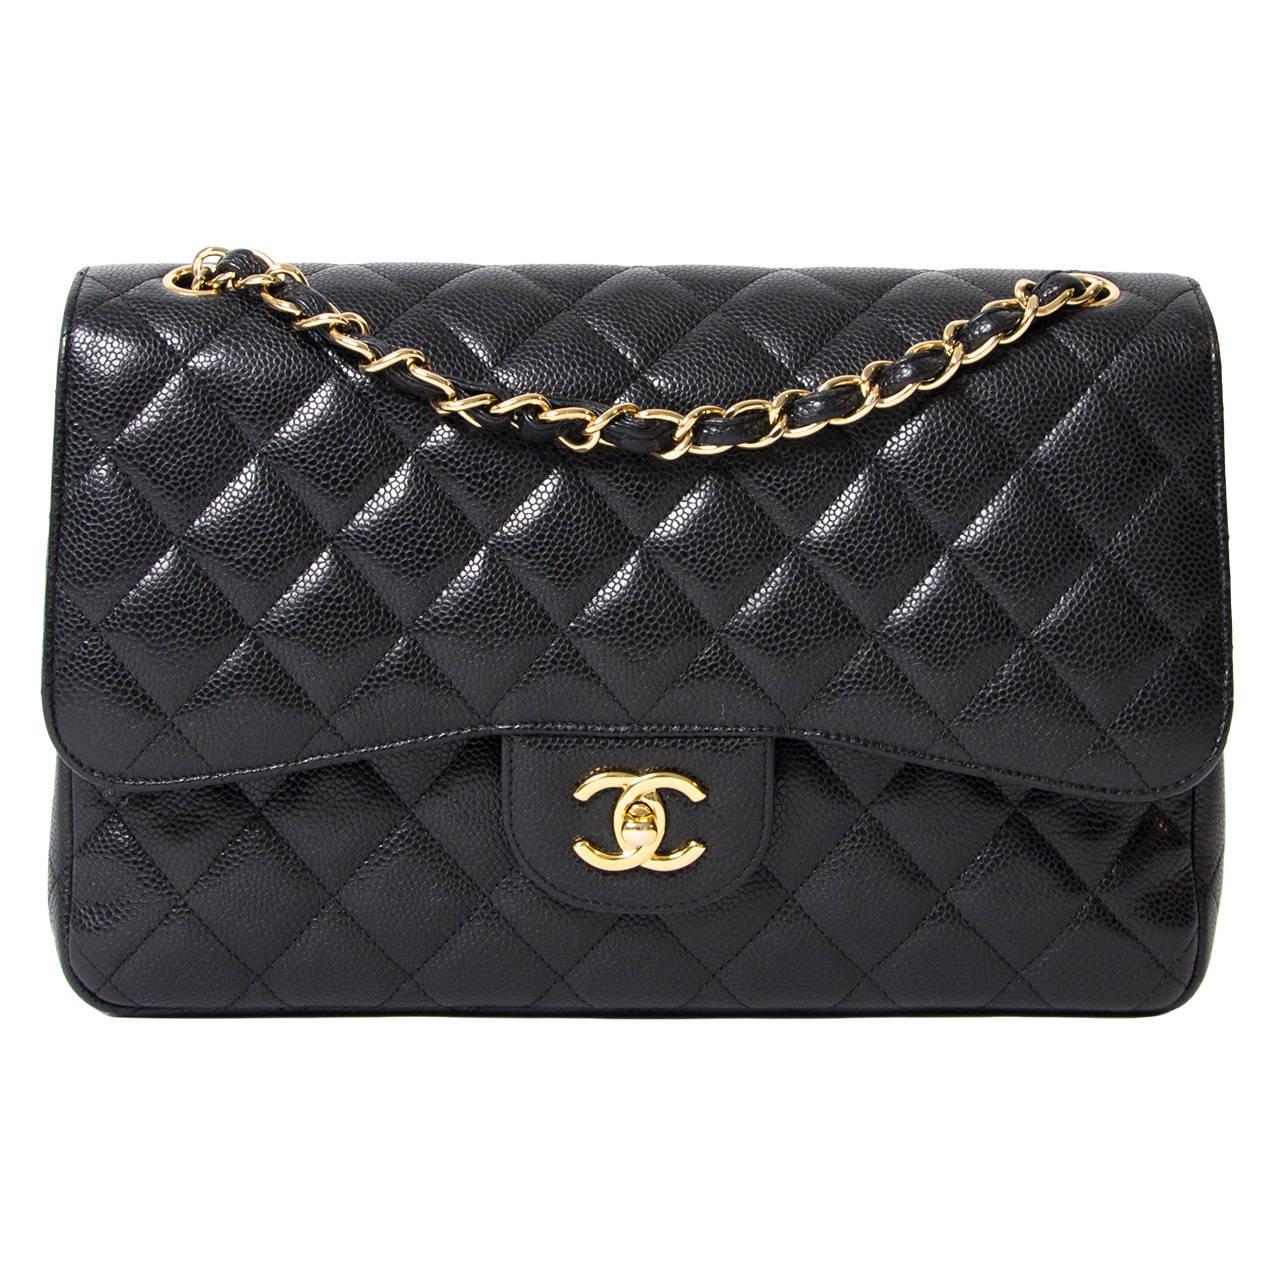 65e8707b98da Chanel Black Caviar Jumbo Double Flap Bag   Stanford Center for ...